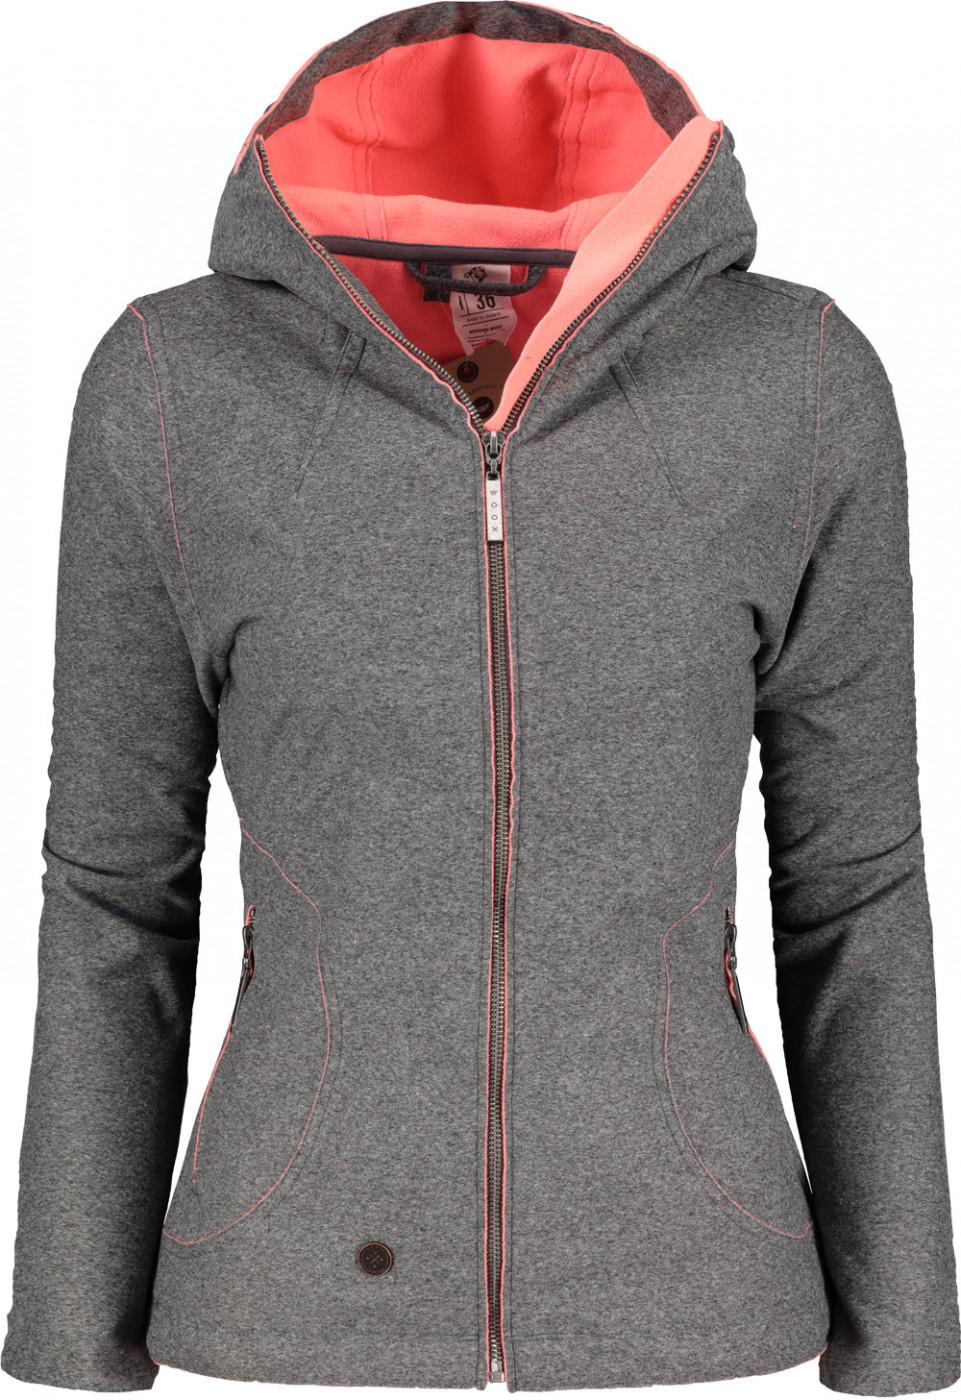 Women's jacket WOOX Woolshell Pilosella